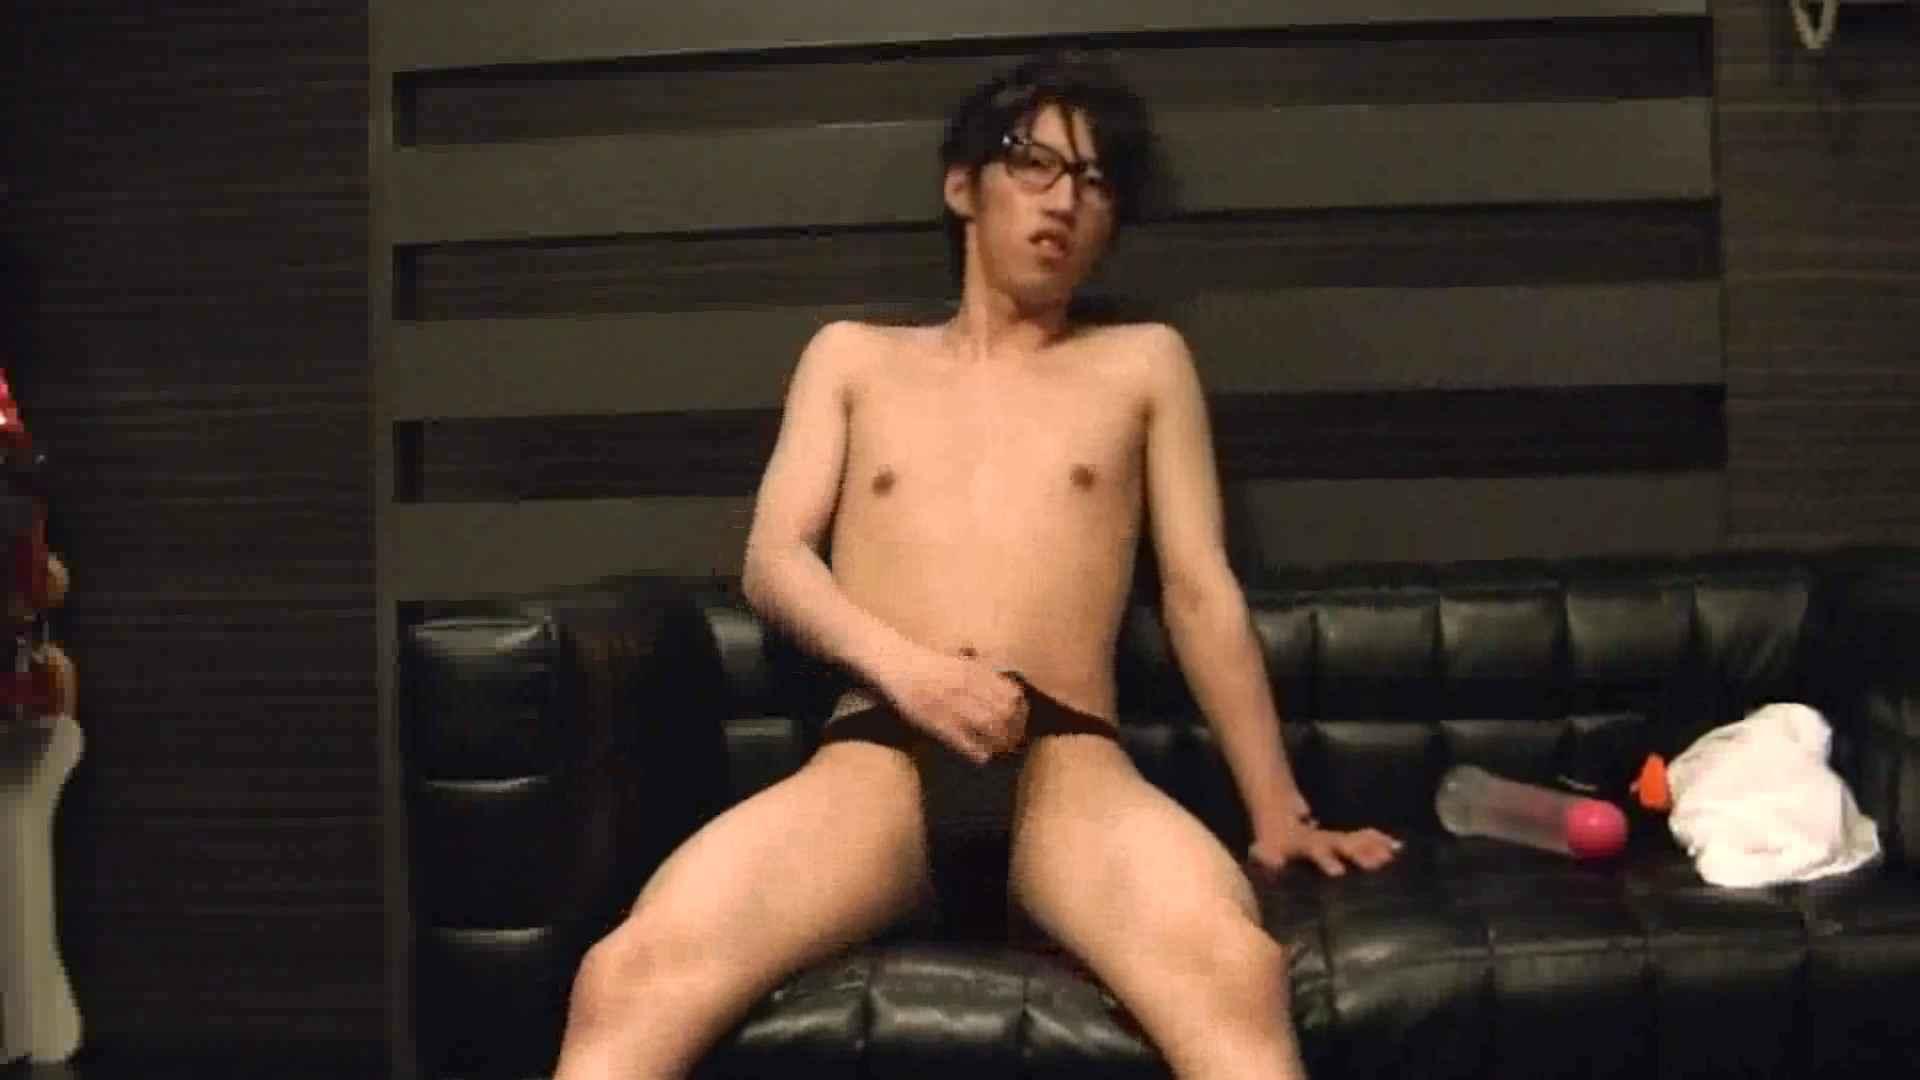 ONA見せカーニバル!! Vol3 男  93pic 54